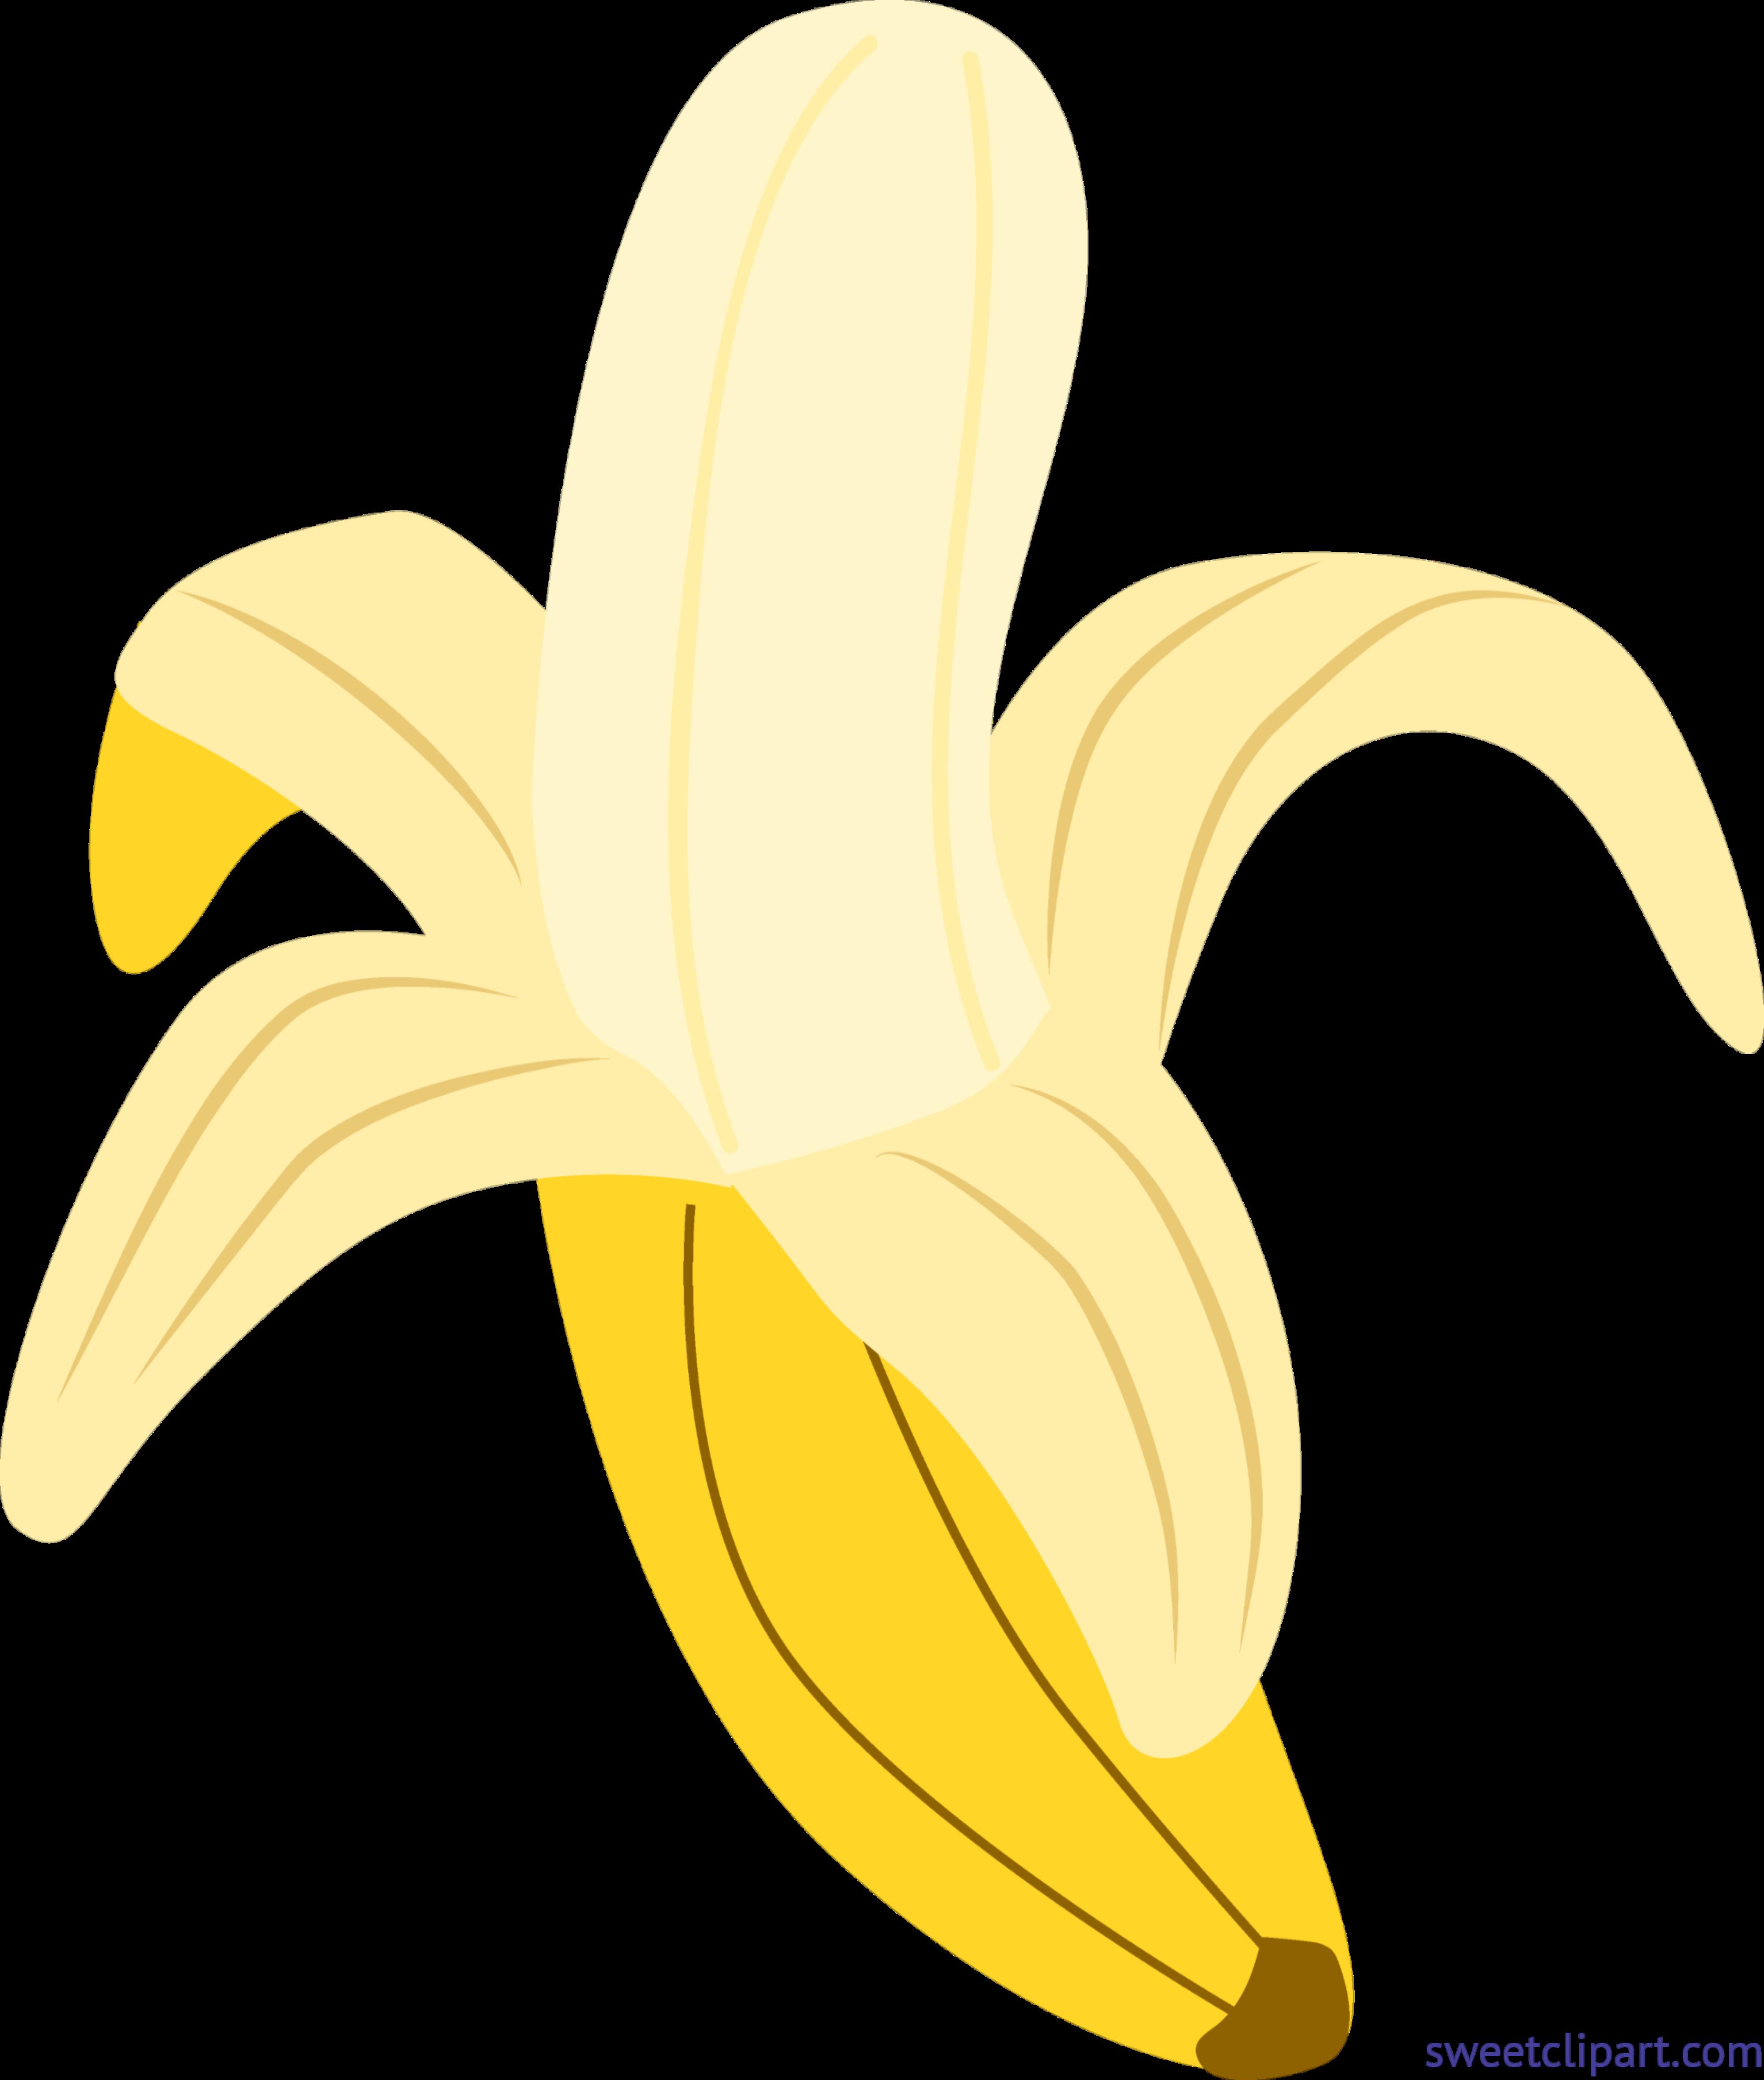 Clip art sweet. Clipart phone banana